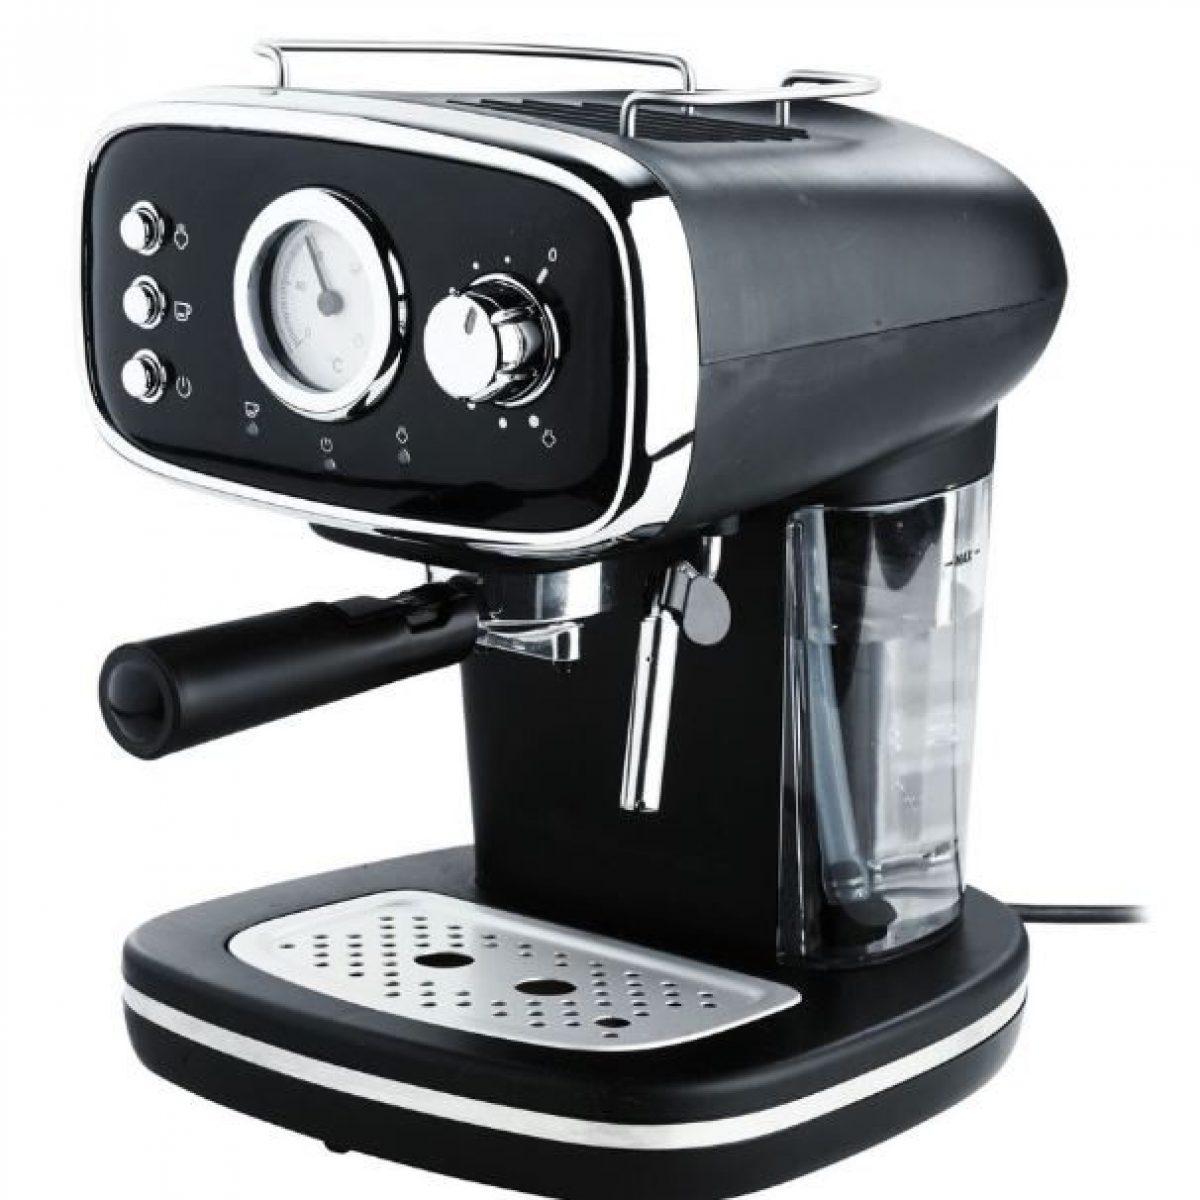 Macchina Per Caffe Espresso Silvercrest Lidl